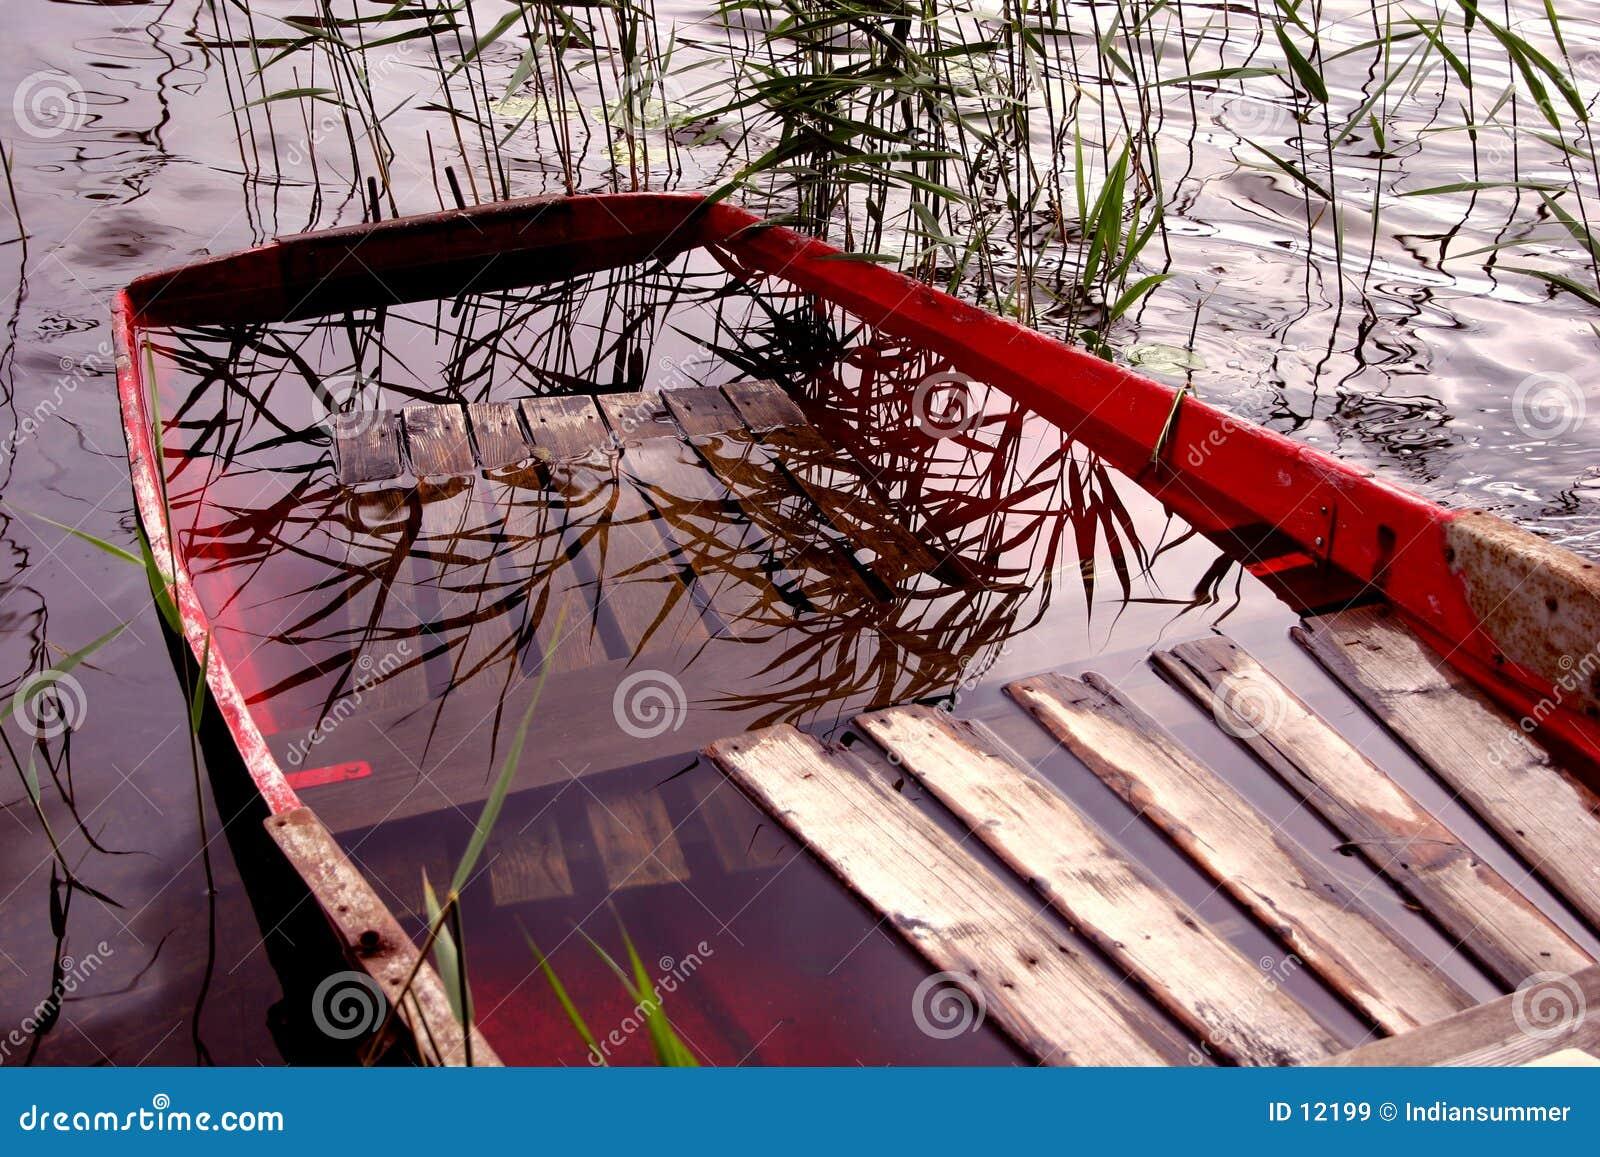 Boat full of water